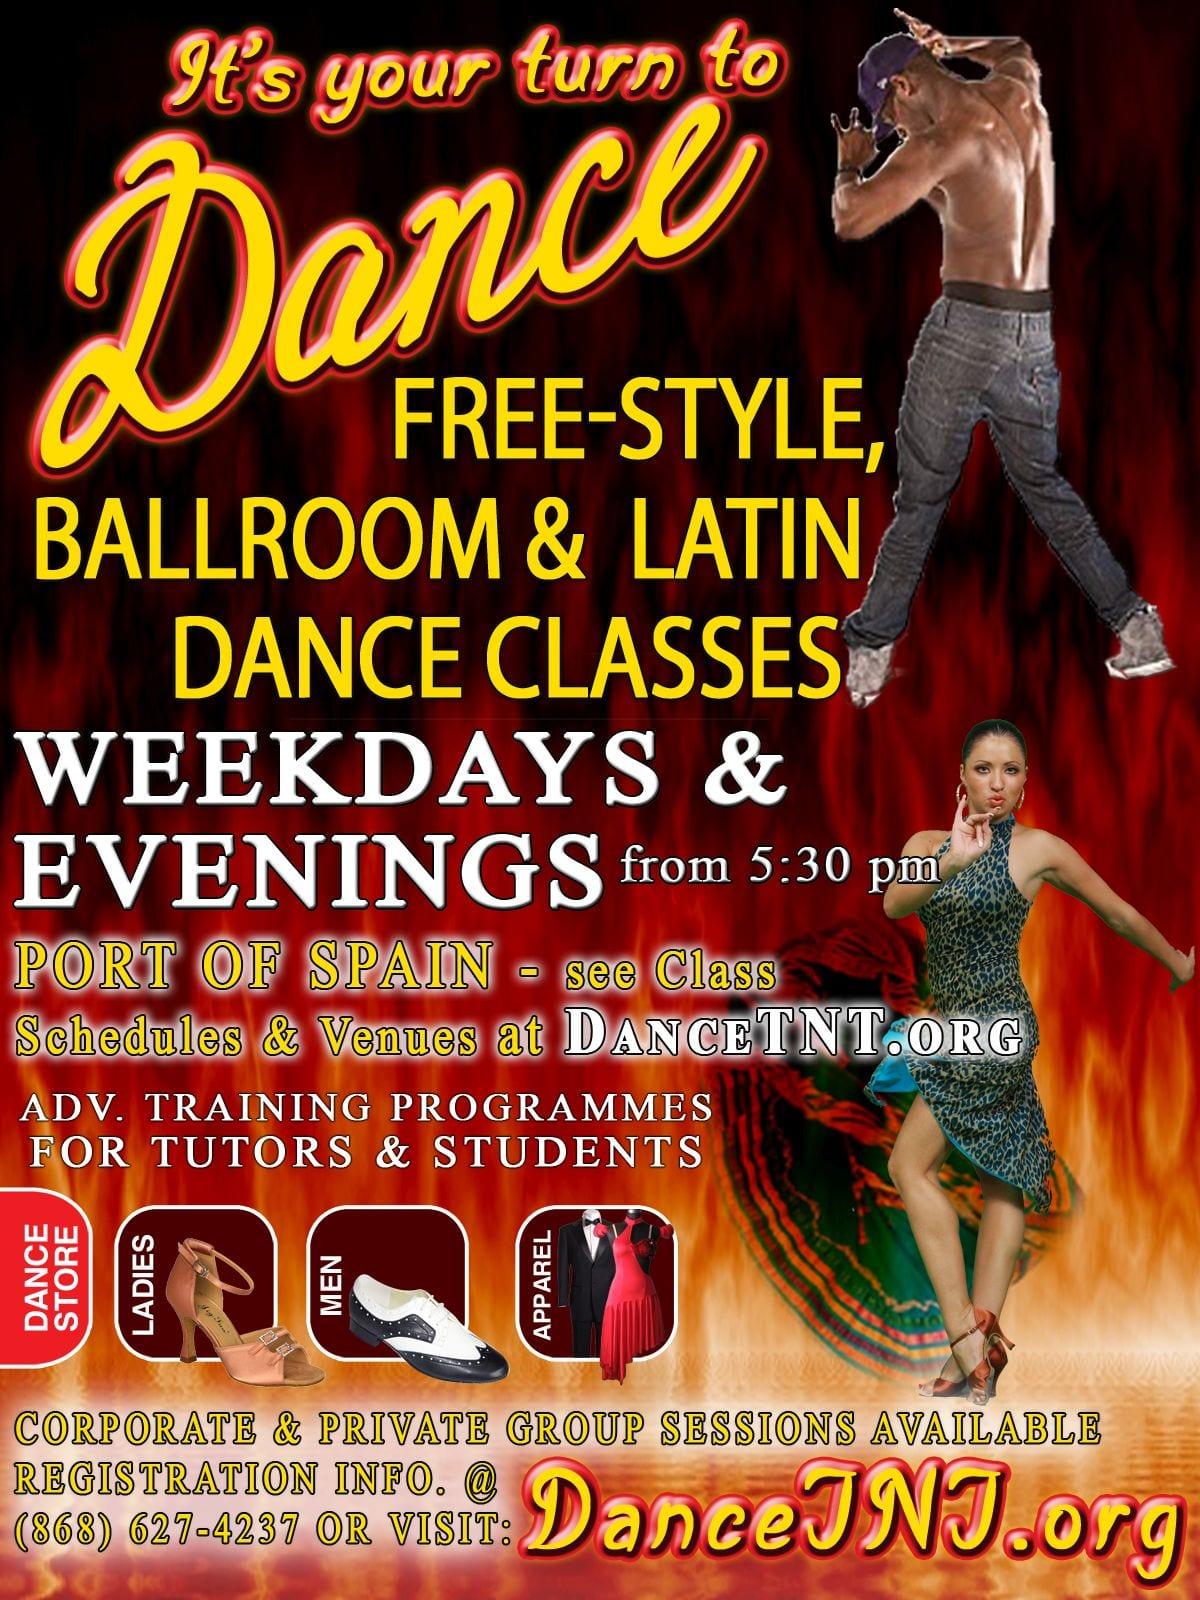 ABDA Ballroom & Latin Dance Classes